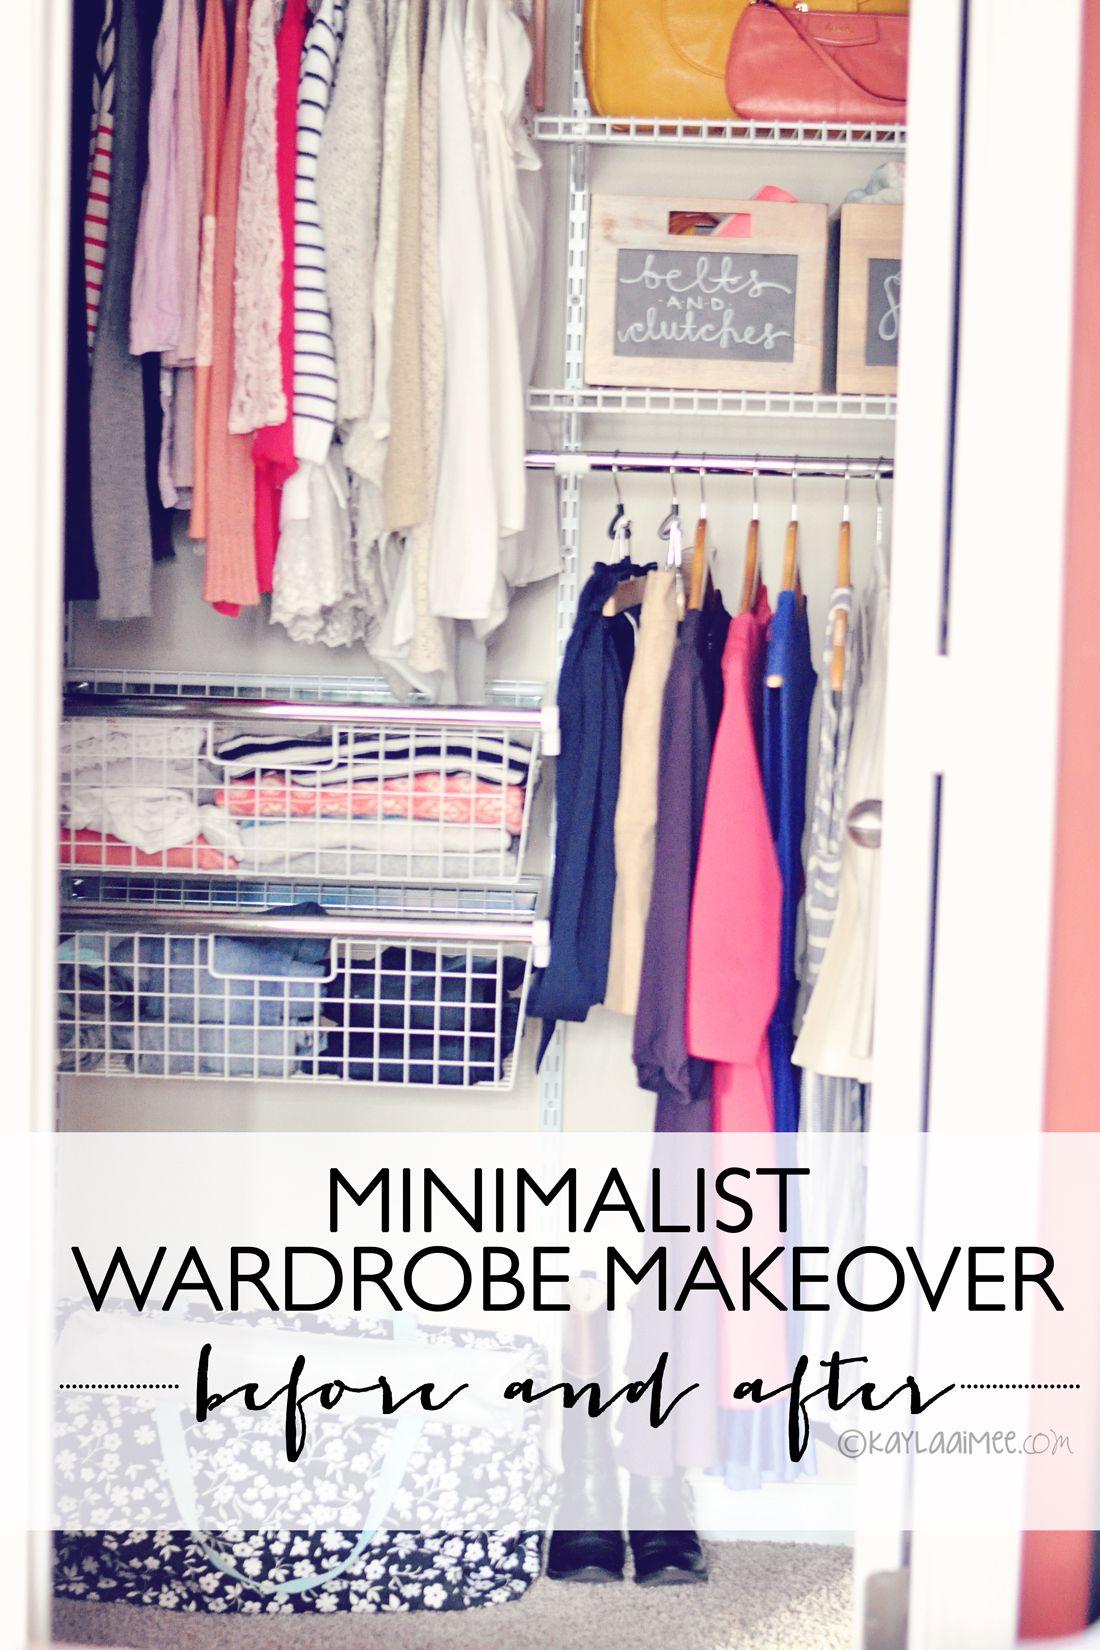 Minimalist Wardrobe Makeover Closet Before After My Blog Posts